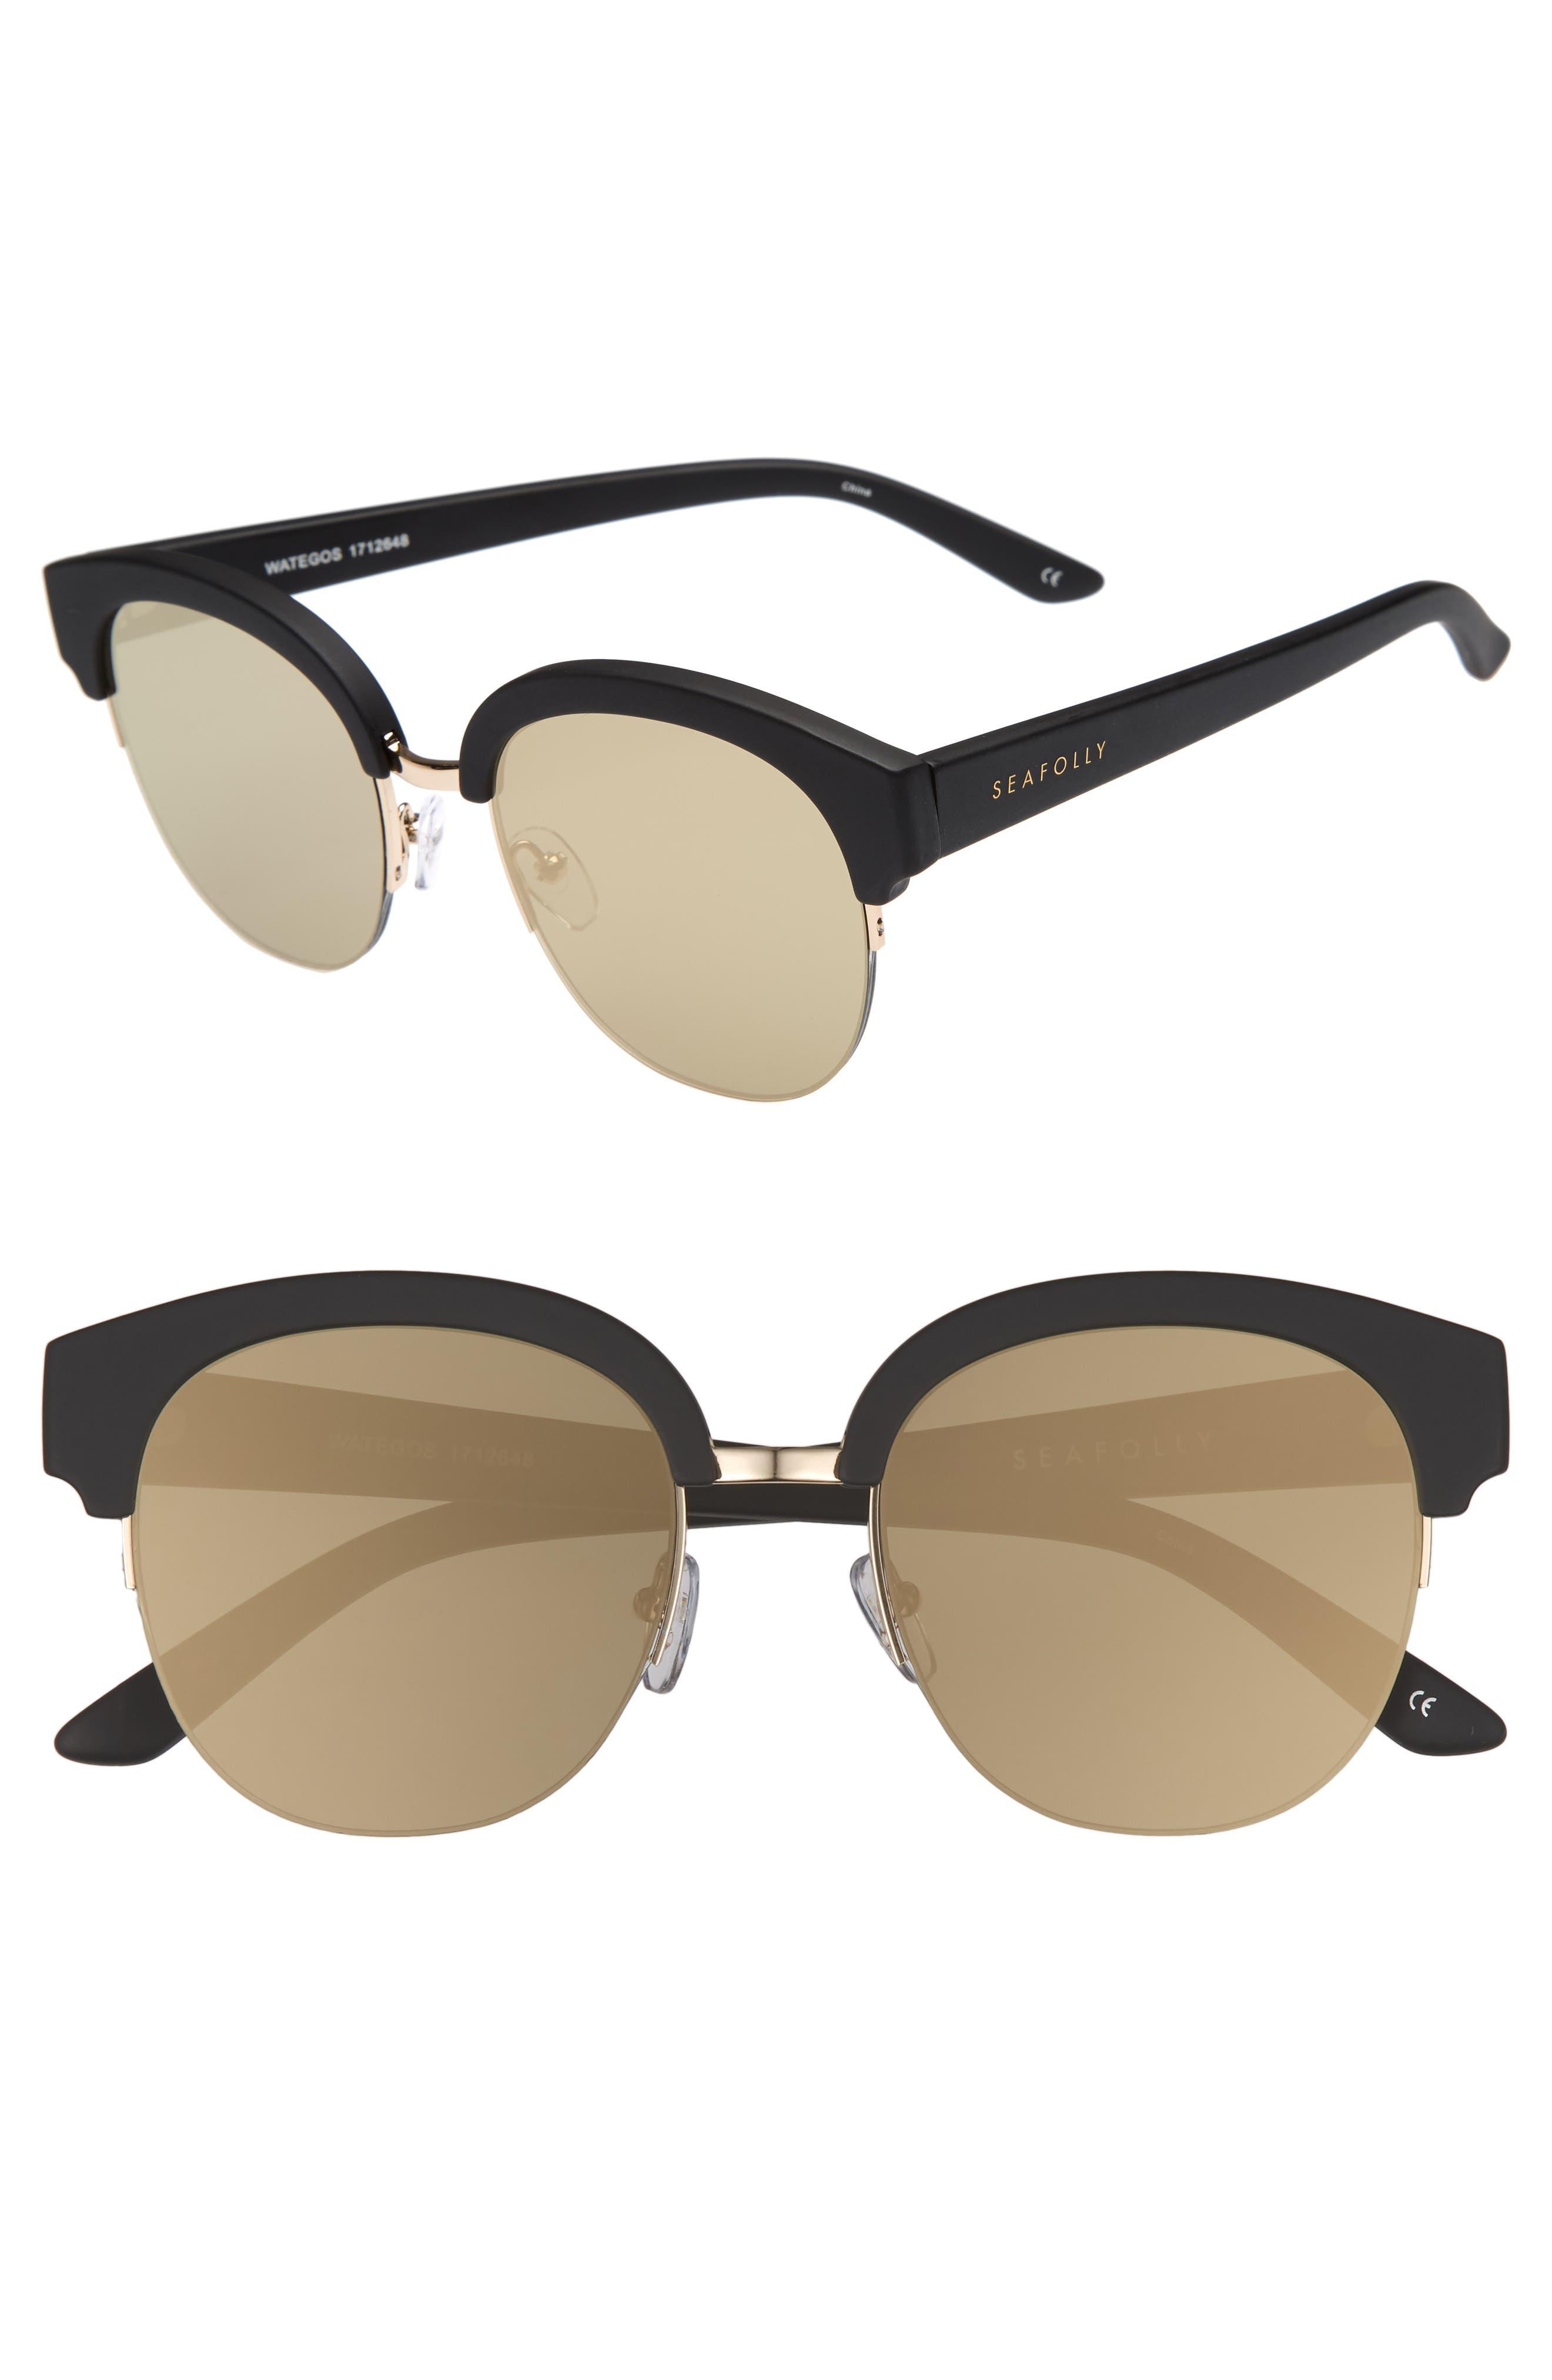 Wategos 53mm Cat Eye Sunglasses,                             Main thumbnail 1, color,                             001